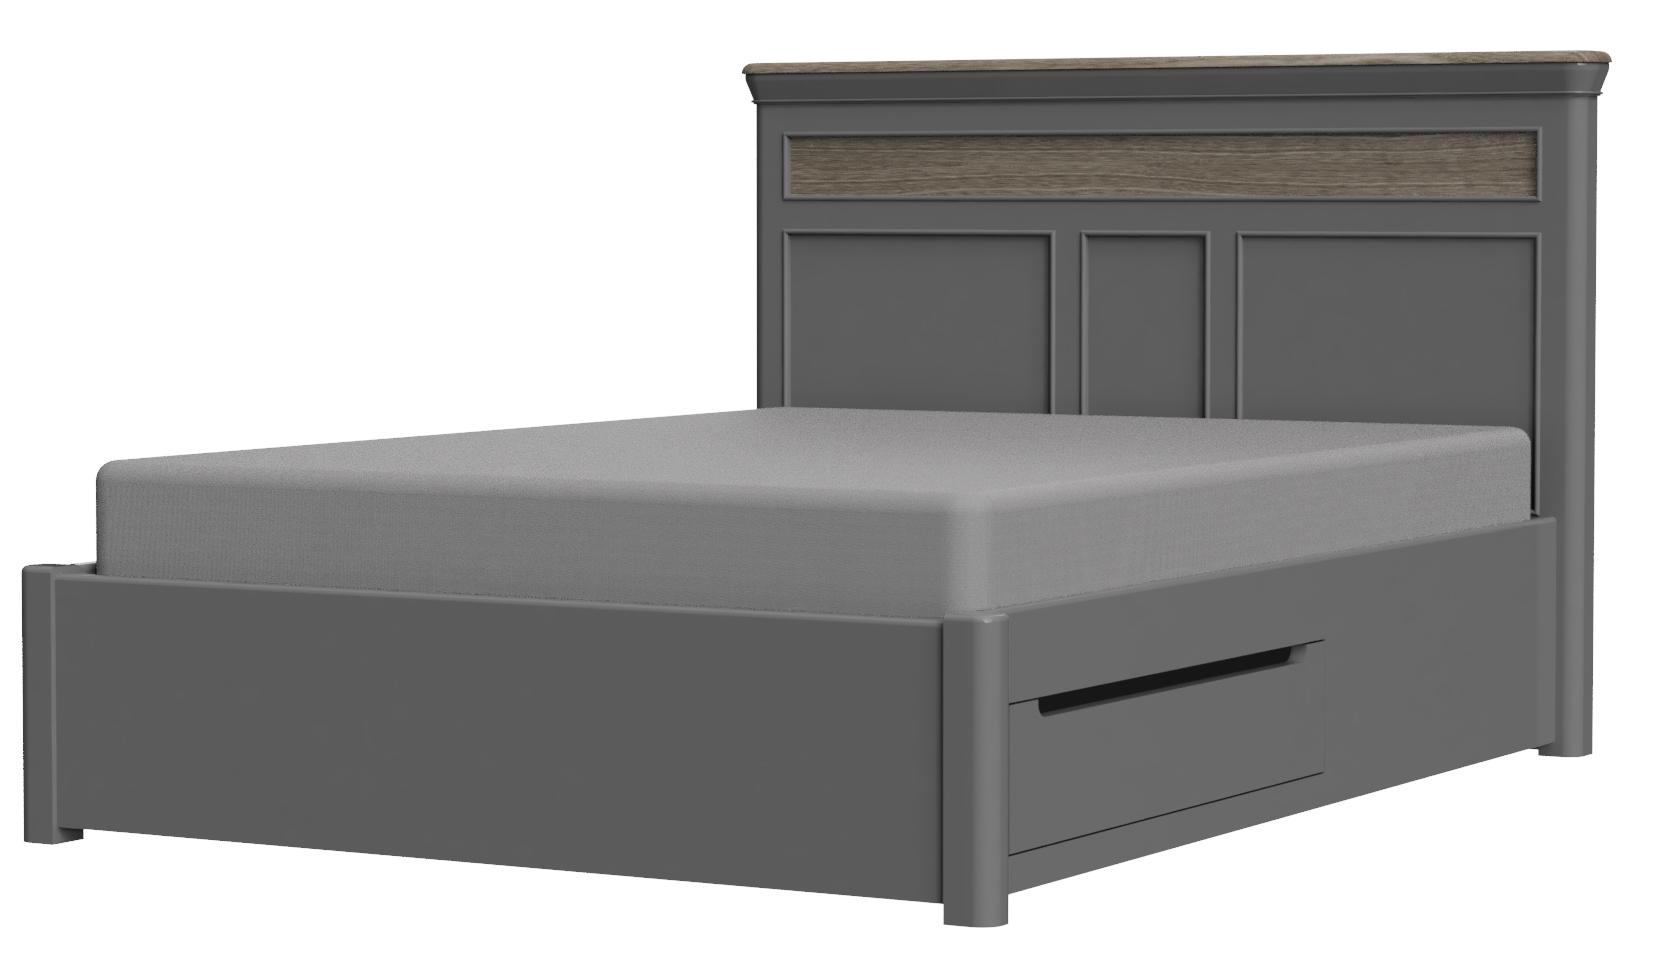 PABLO King 5' Bed